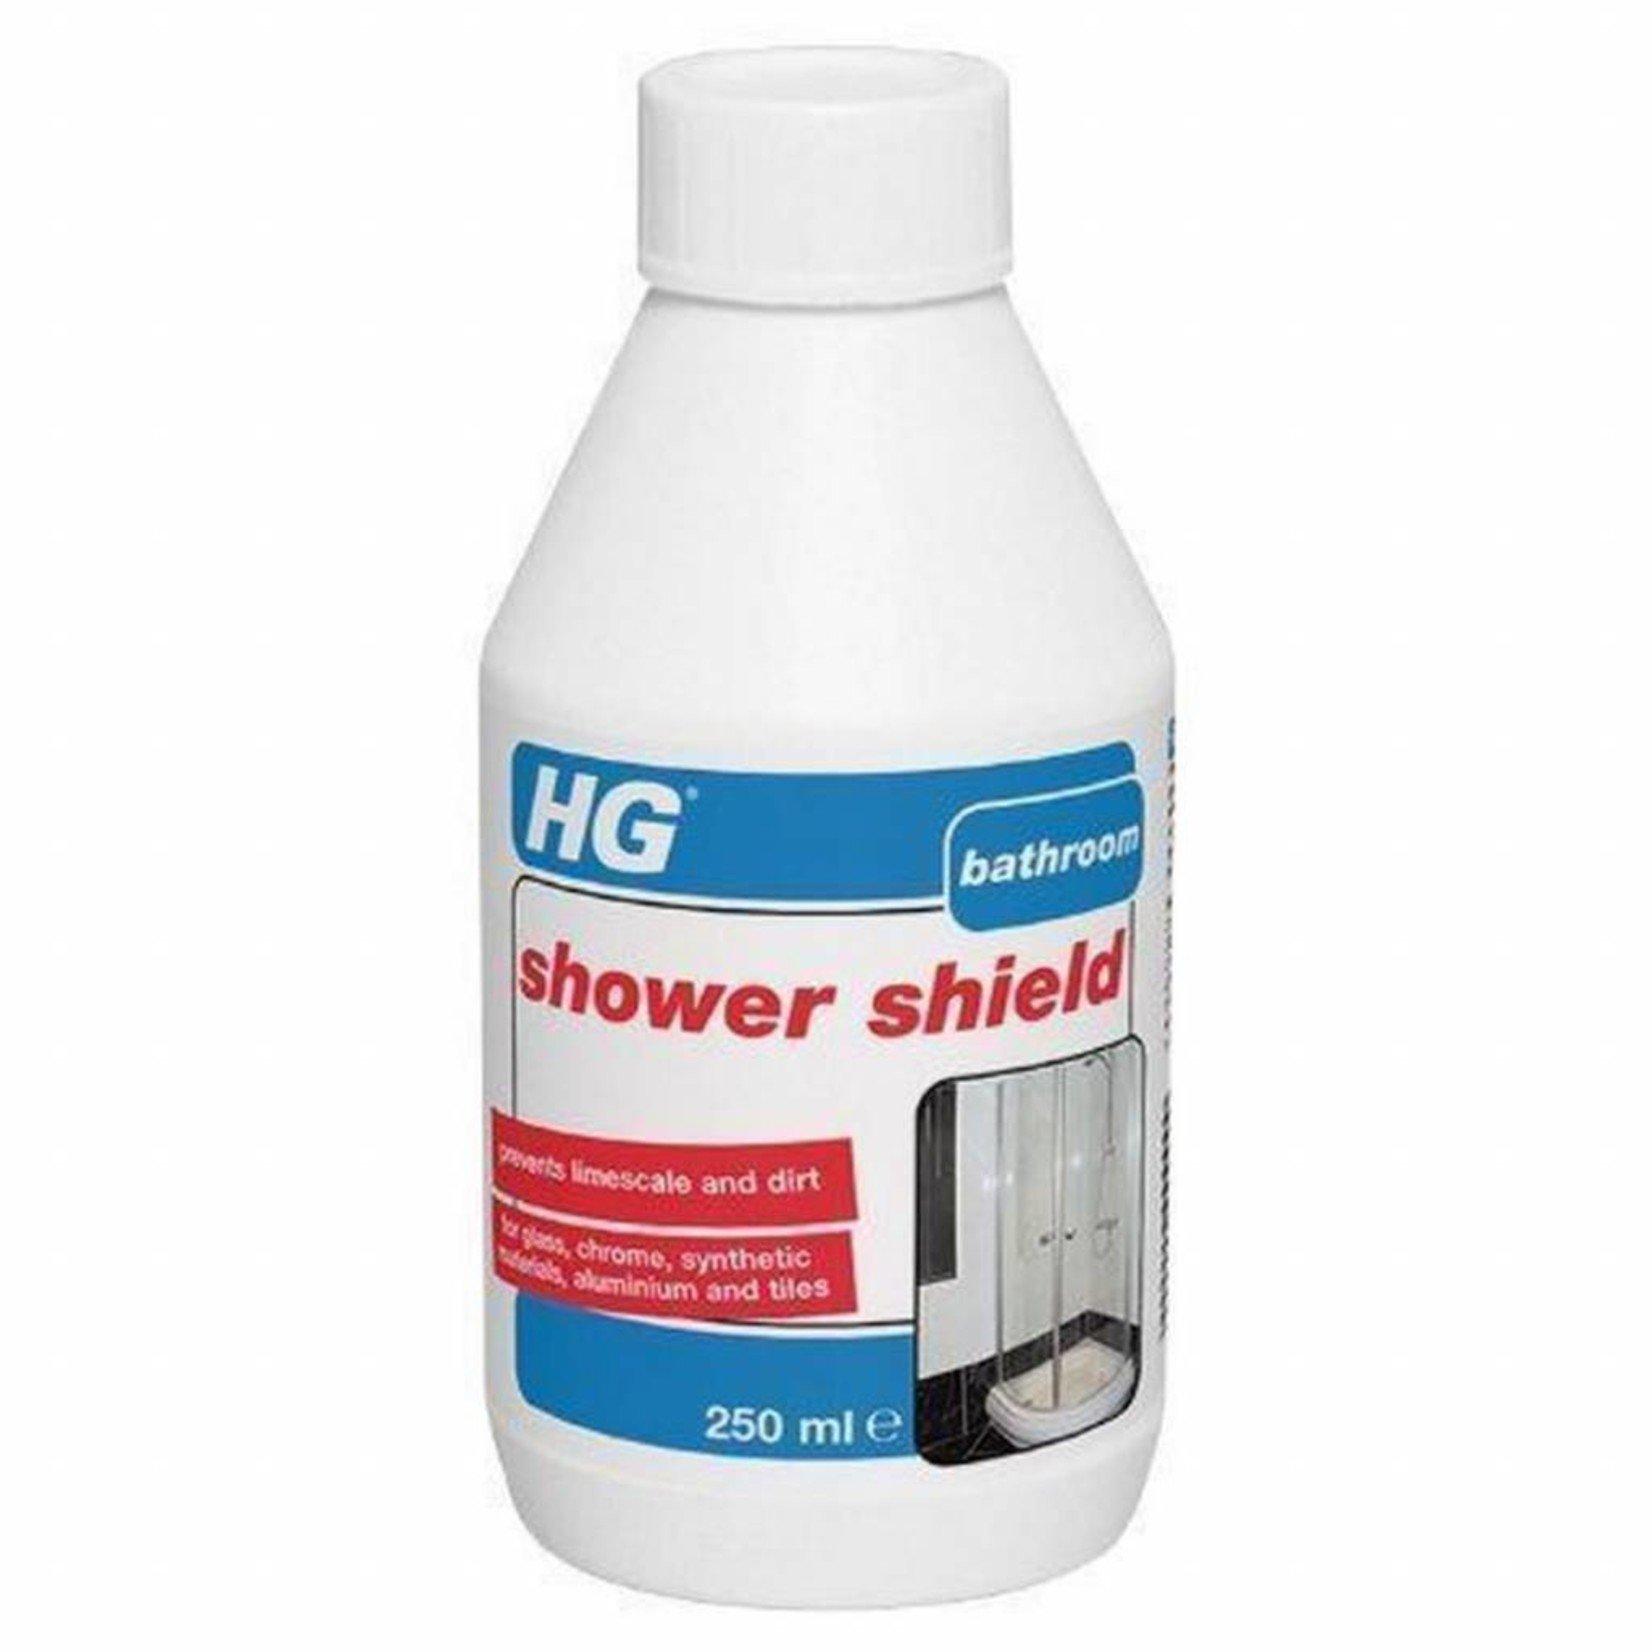 HG Hg Shower Shield           0.25L